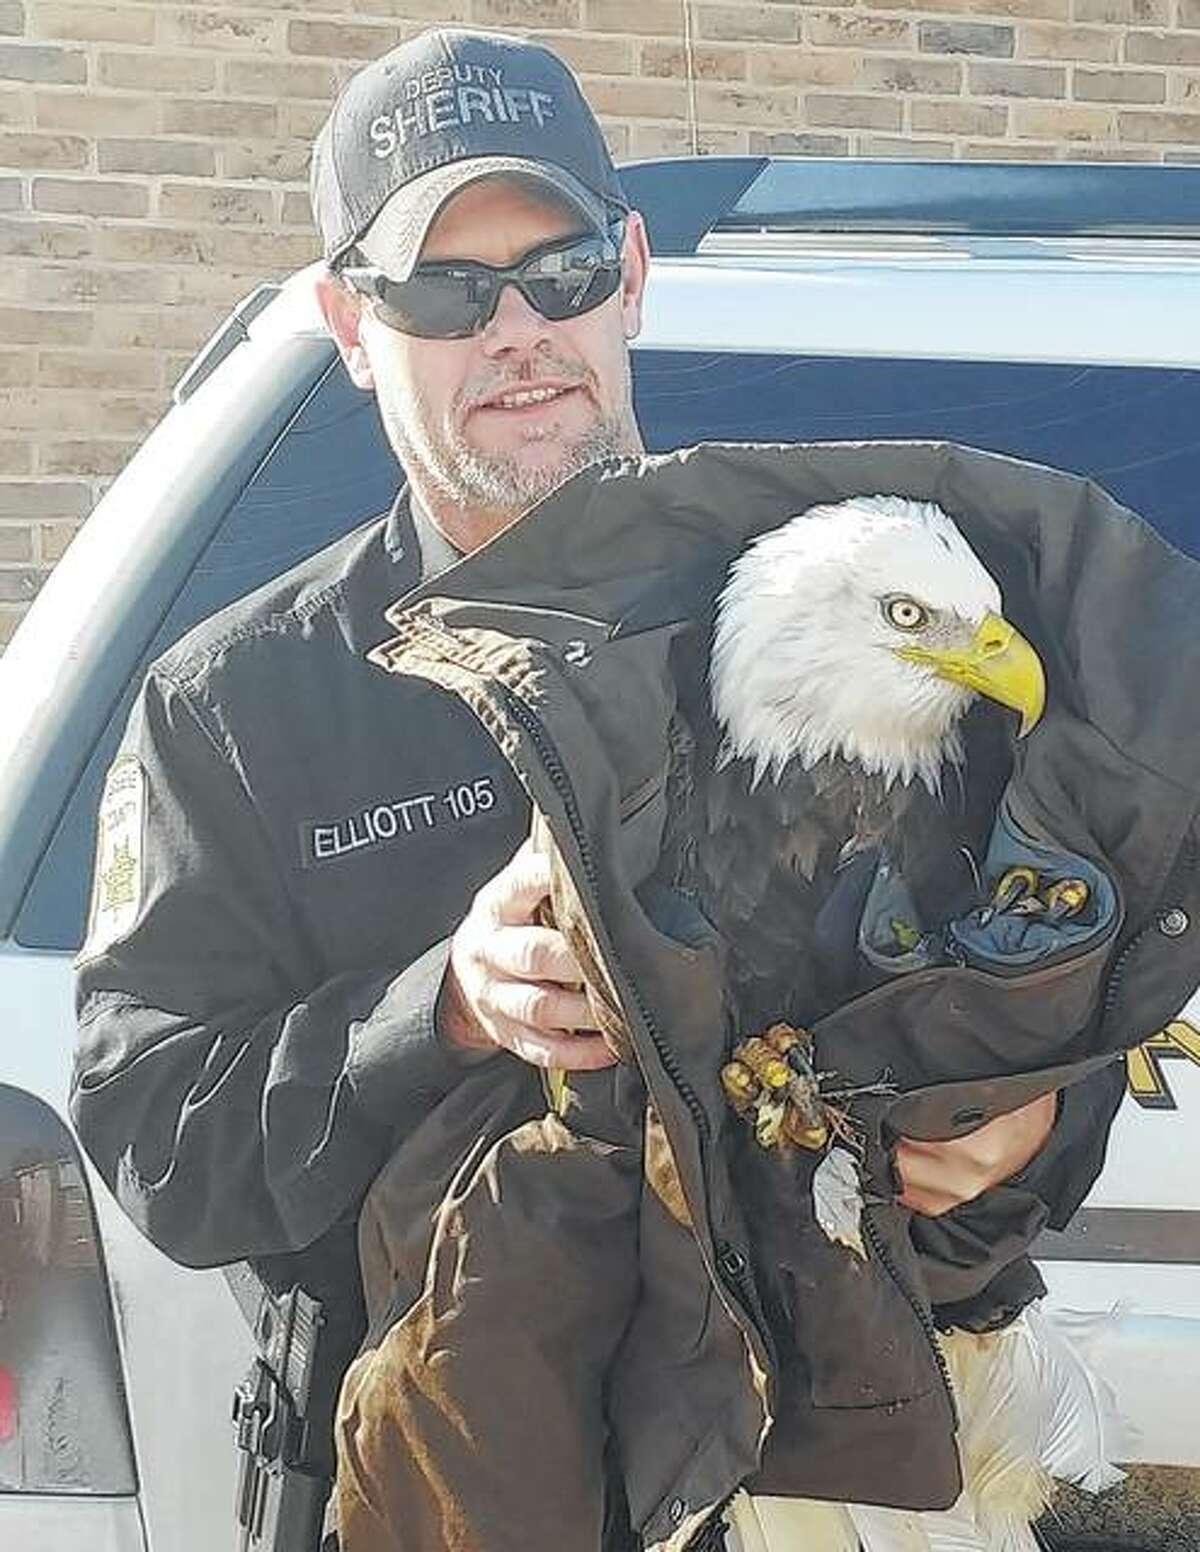 Greene County Sheriff's Deputy Cliff Elliot holds an eagle he rescued in November in Greene County.